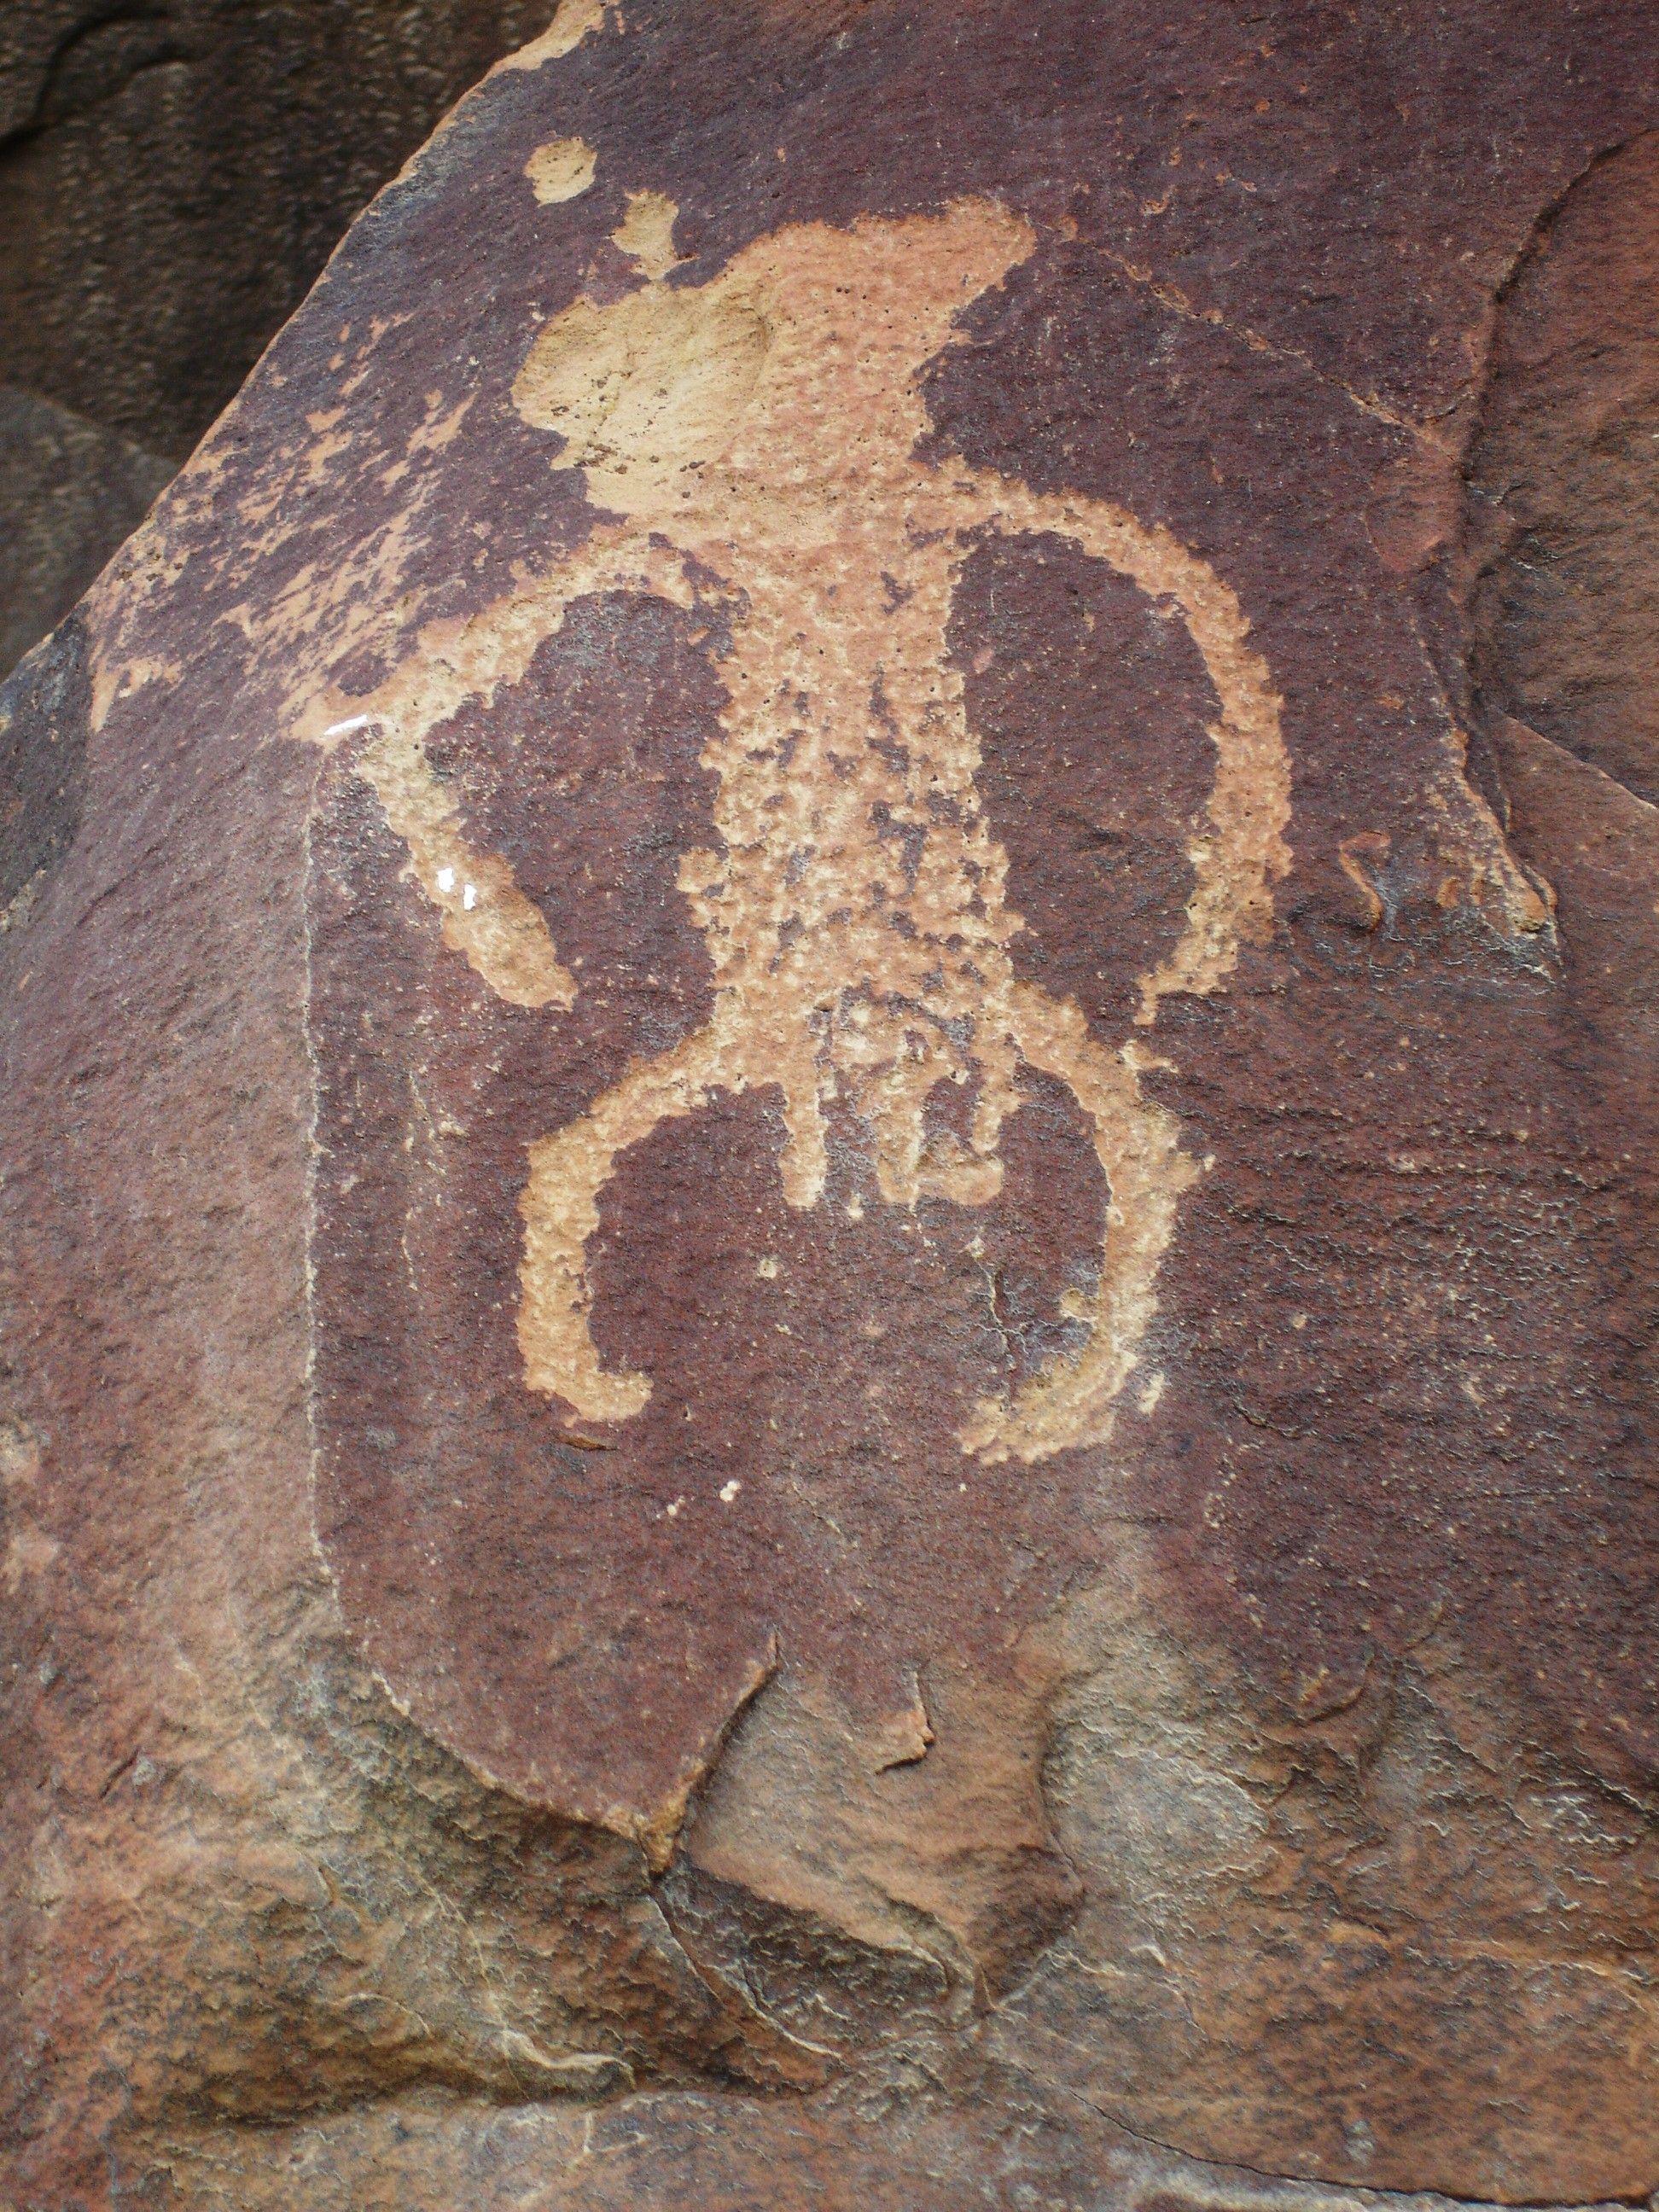 Petroglyph In Wyoming In